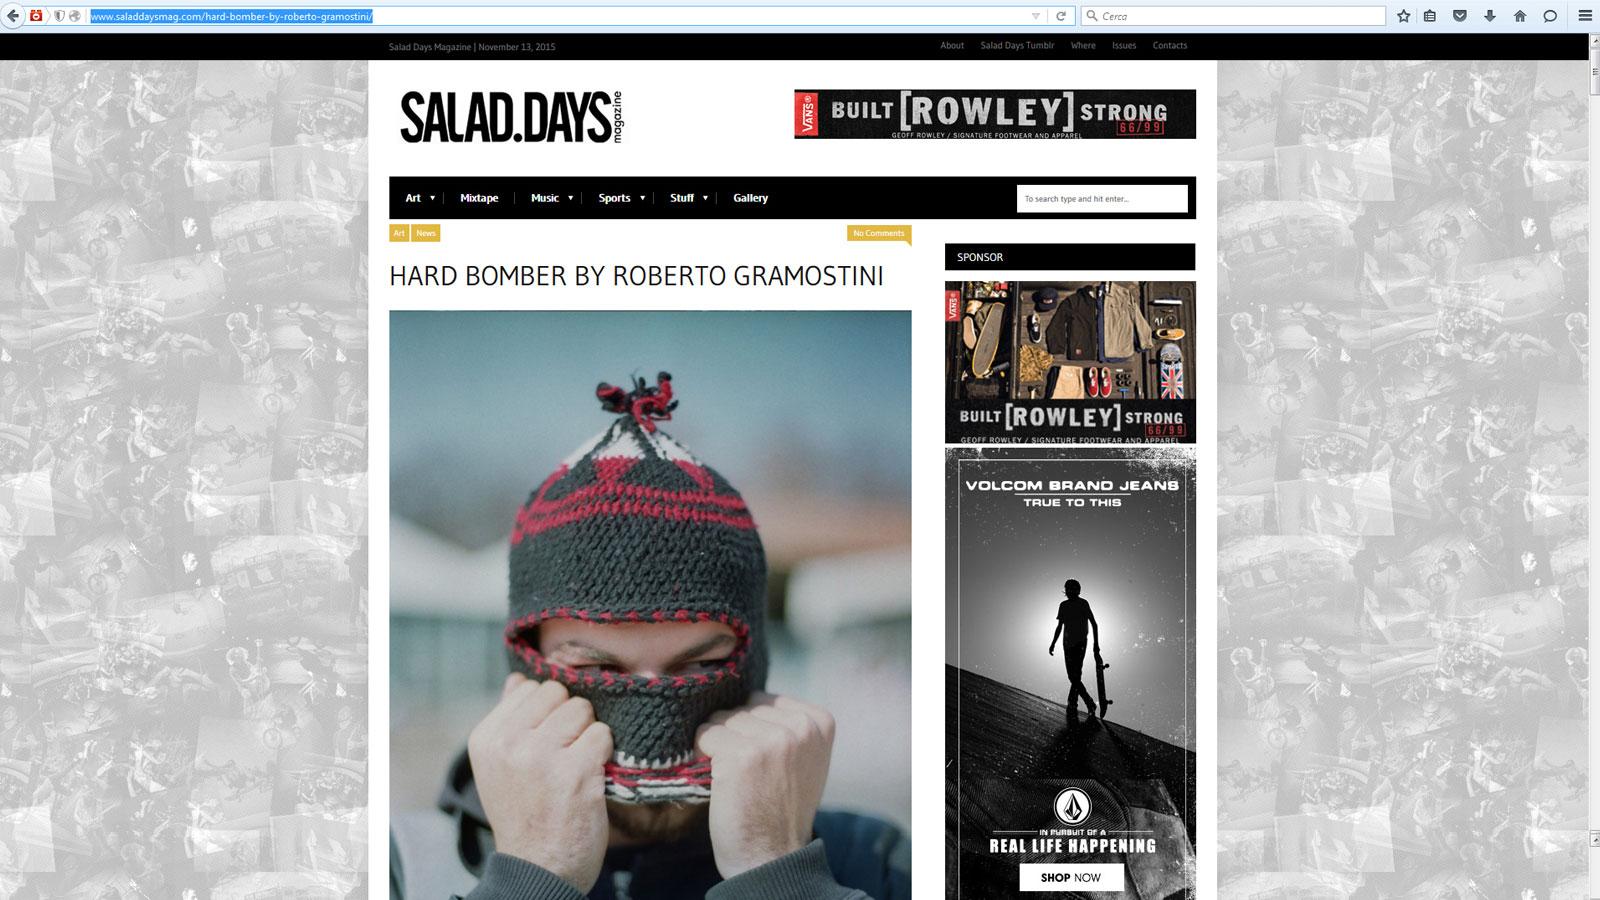 http://www.saladdaysmag.com/hard-bomber-by-roberto-gramostini/